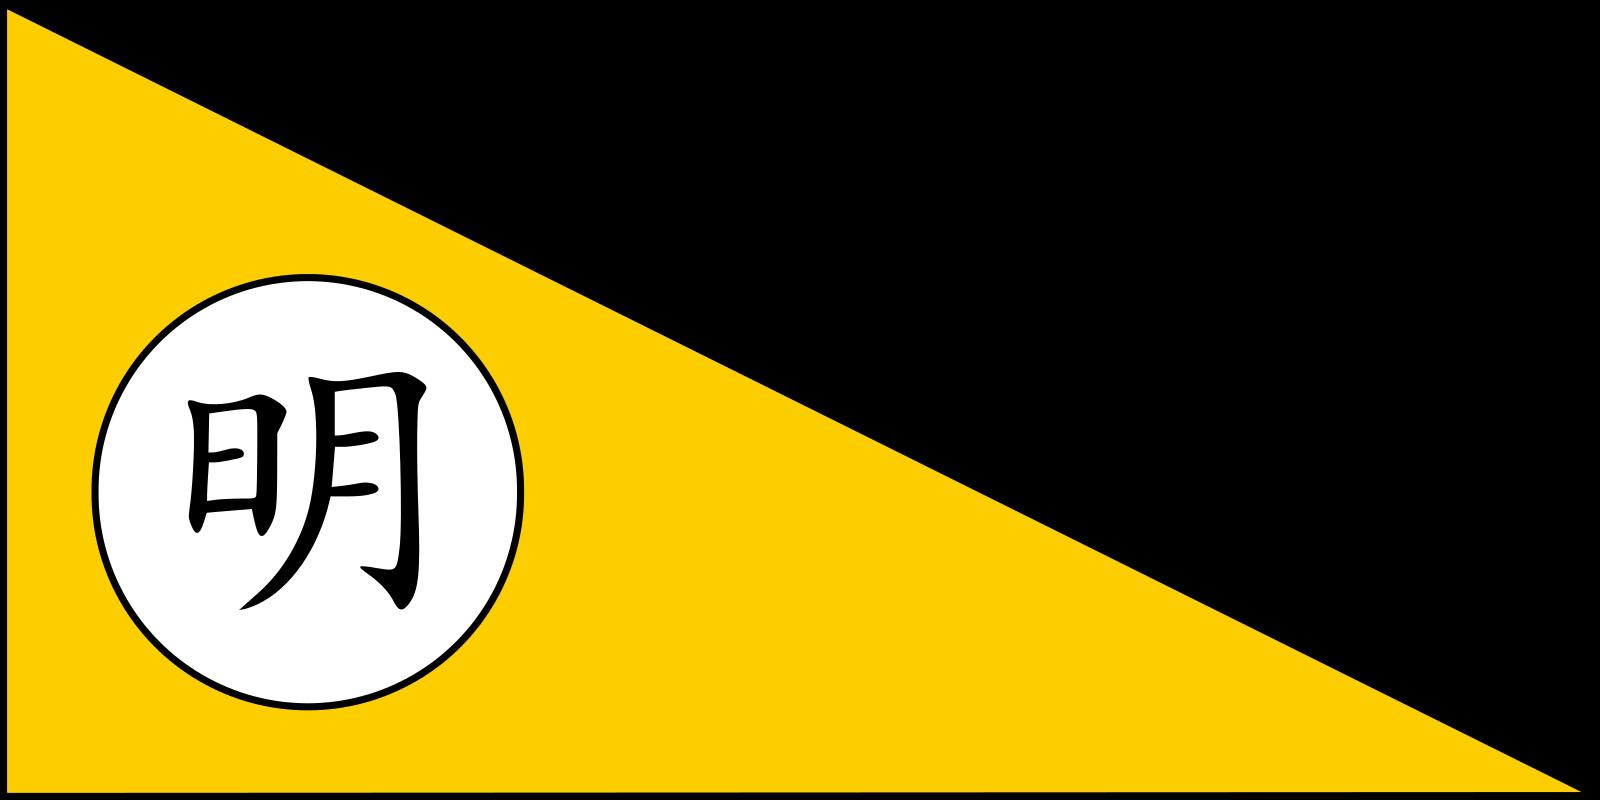 флаг 5